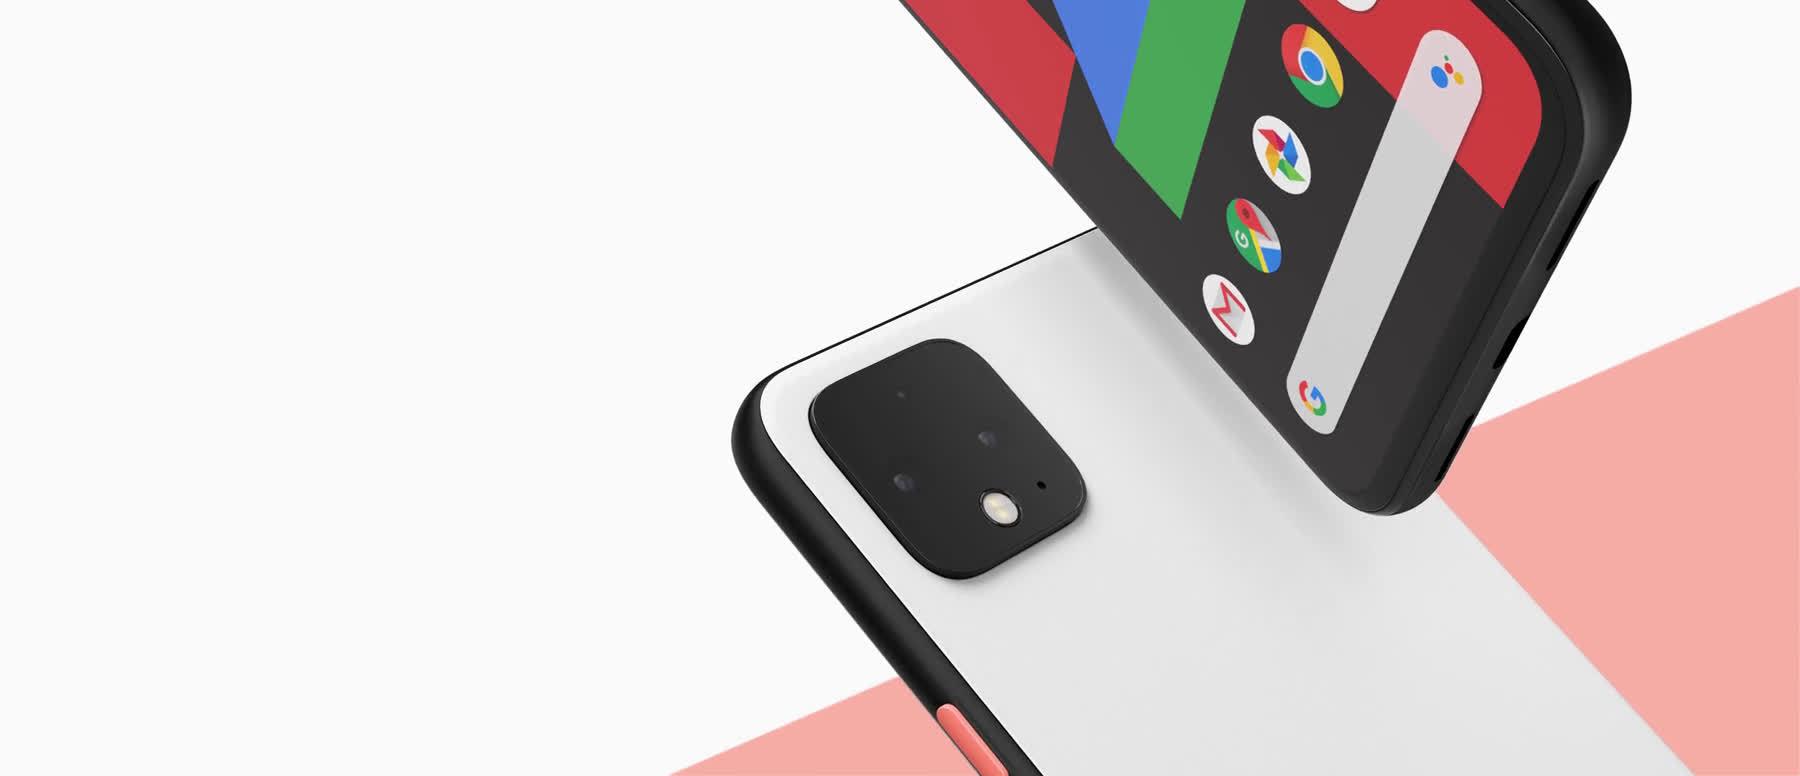 The Google phone.